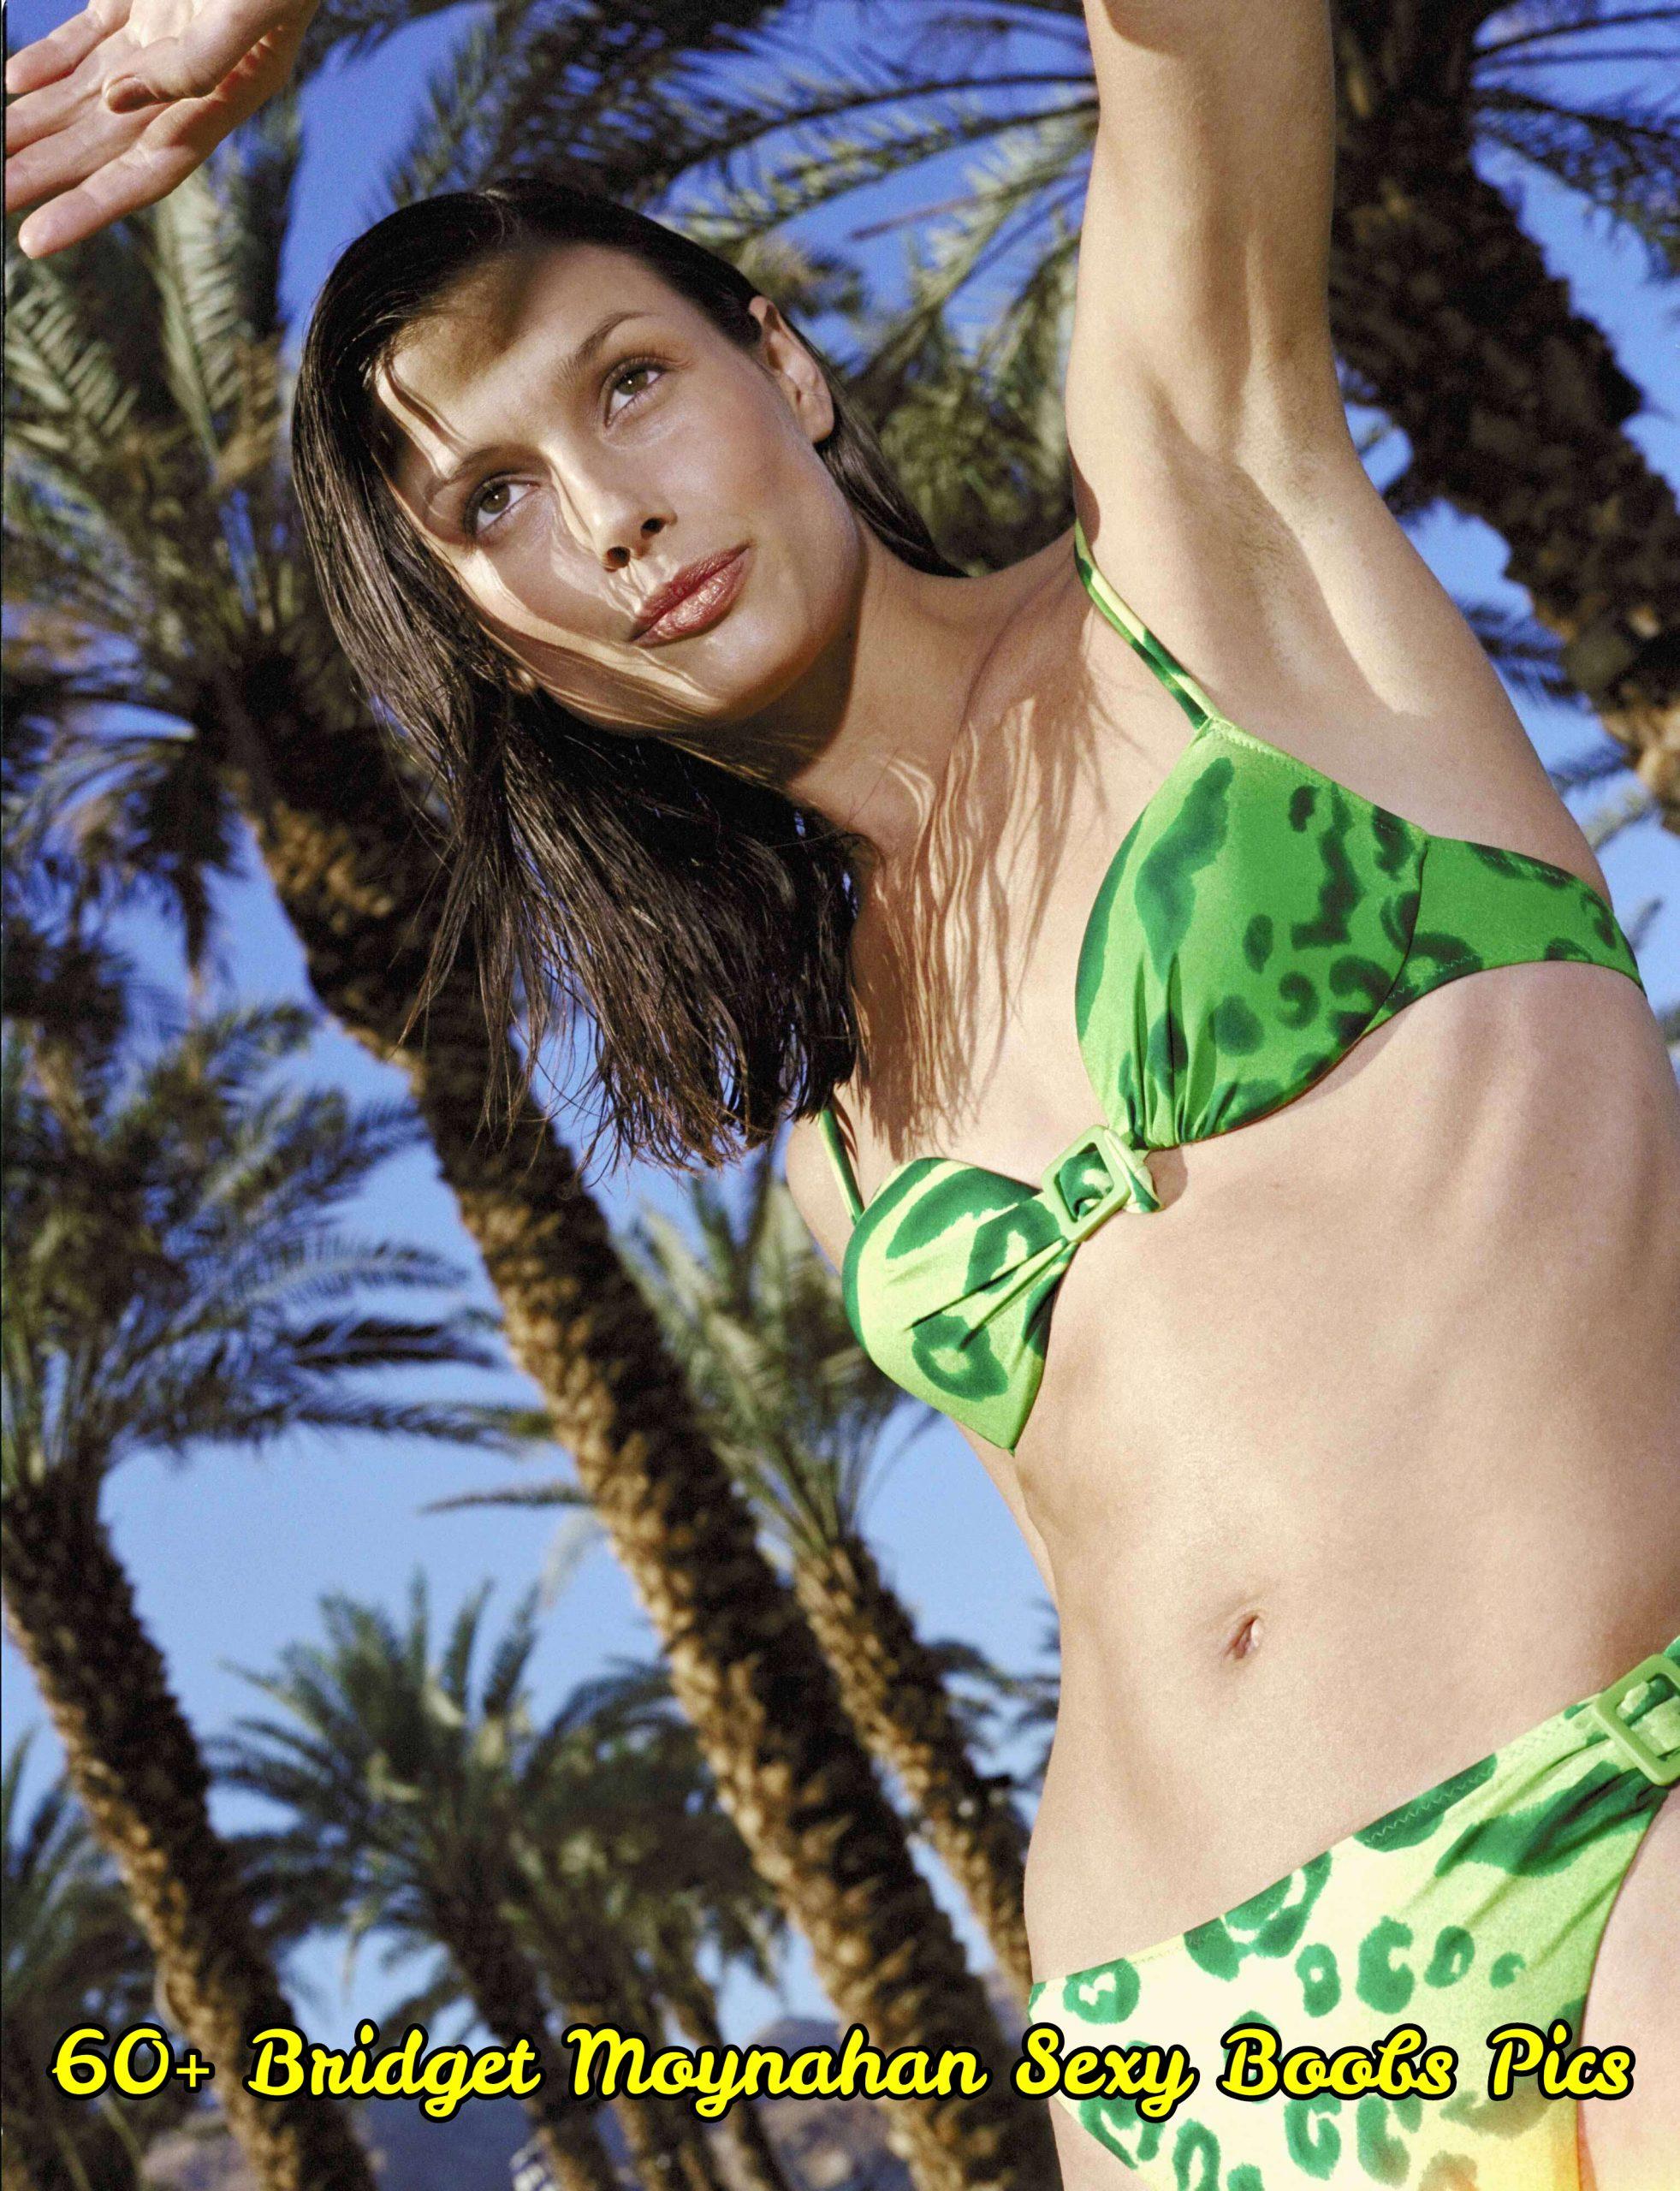 Bridget Moynahan sexy boobs pics